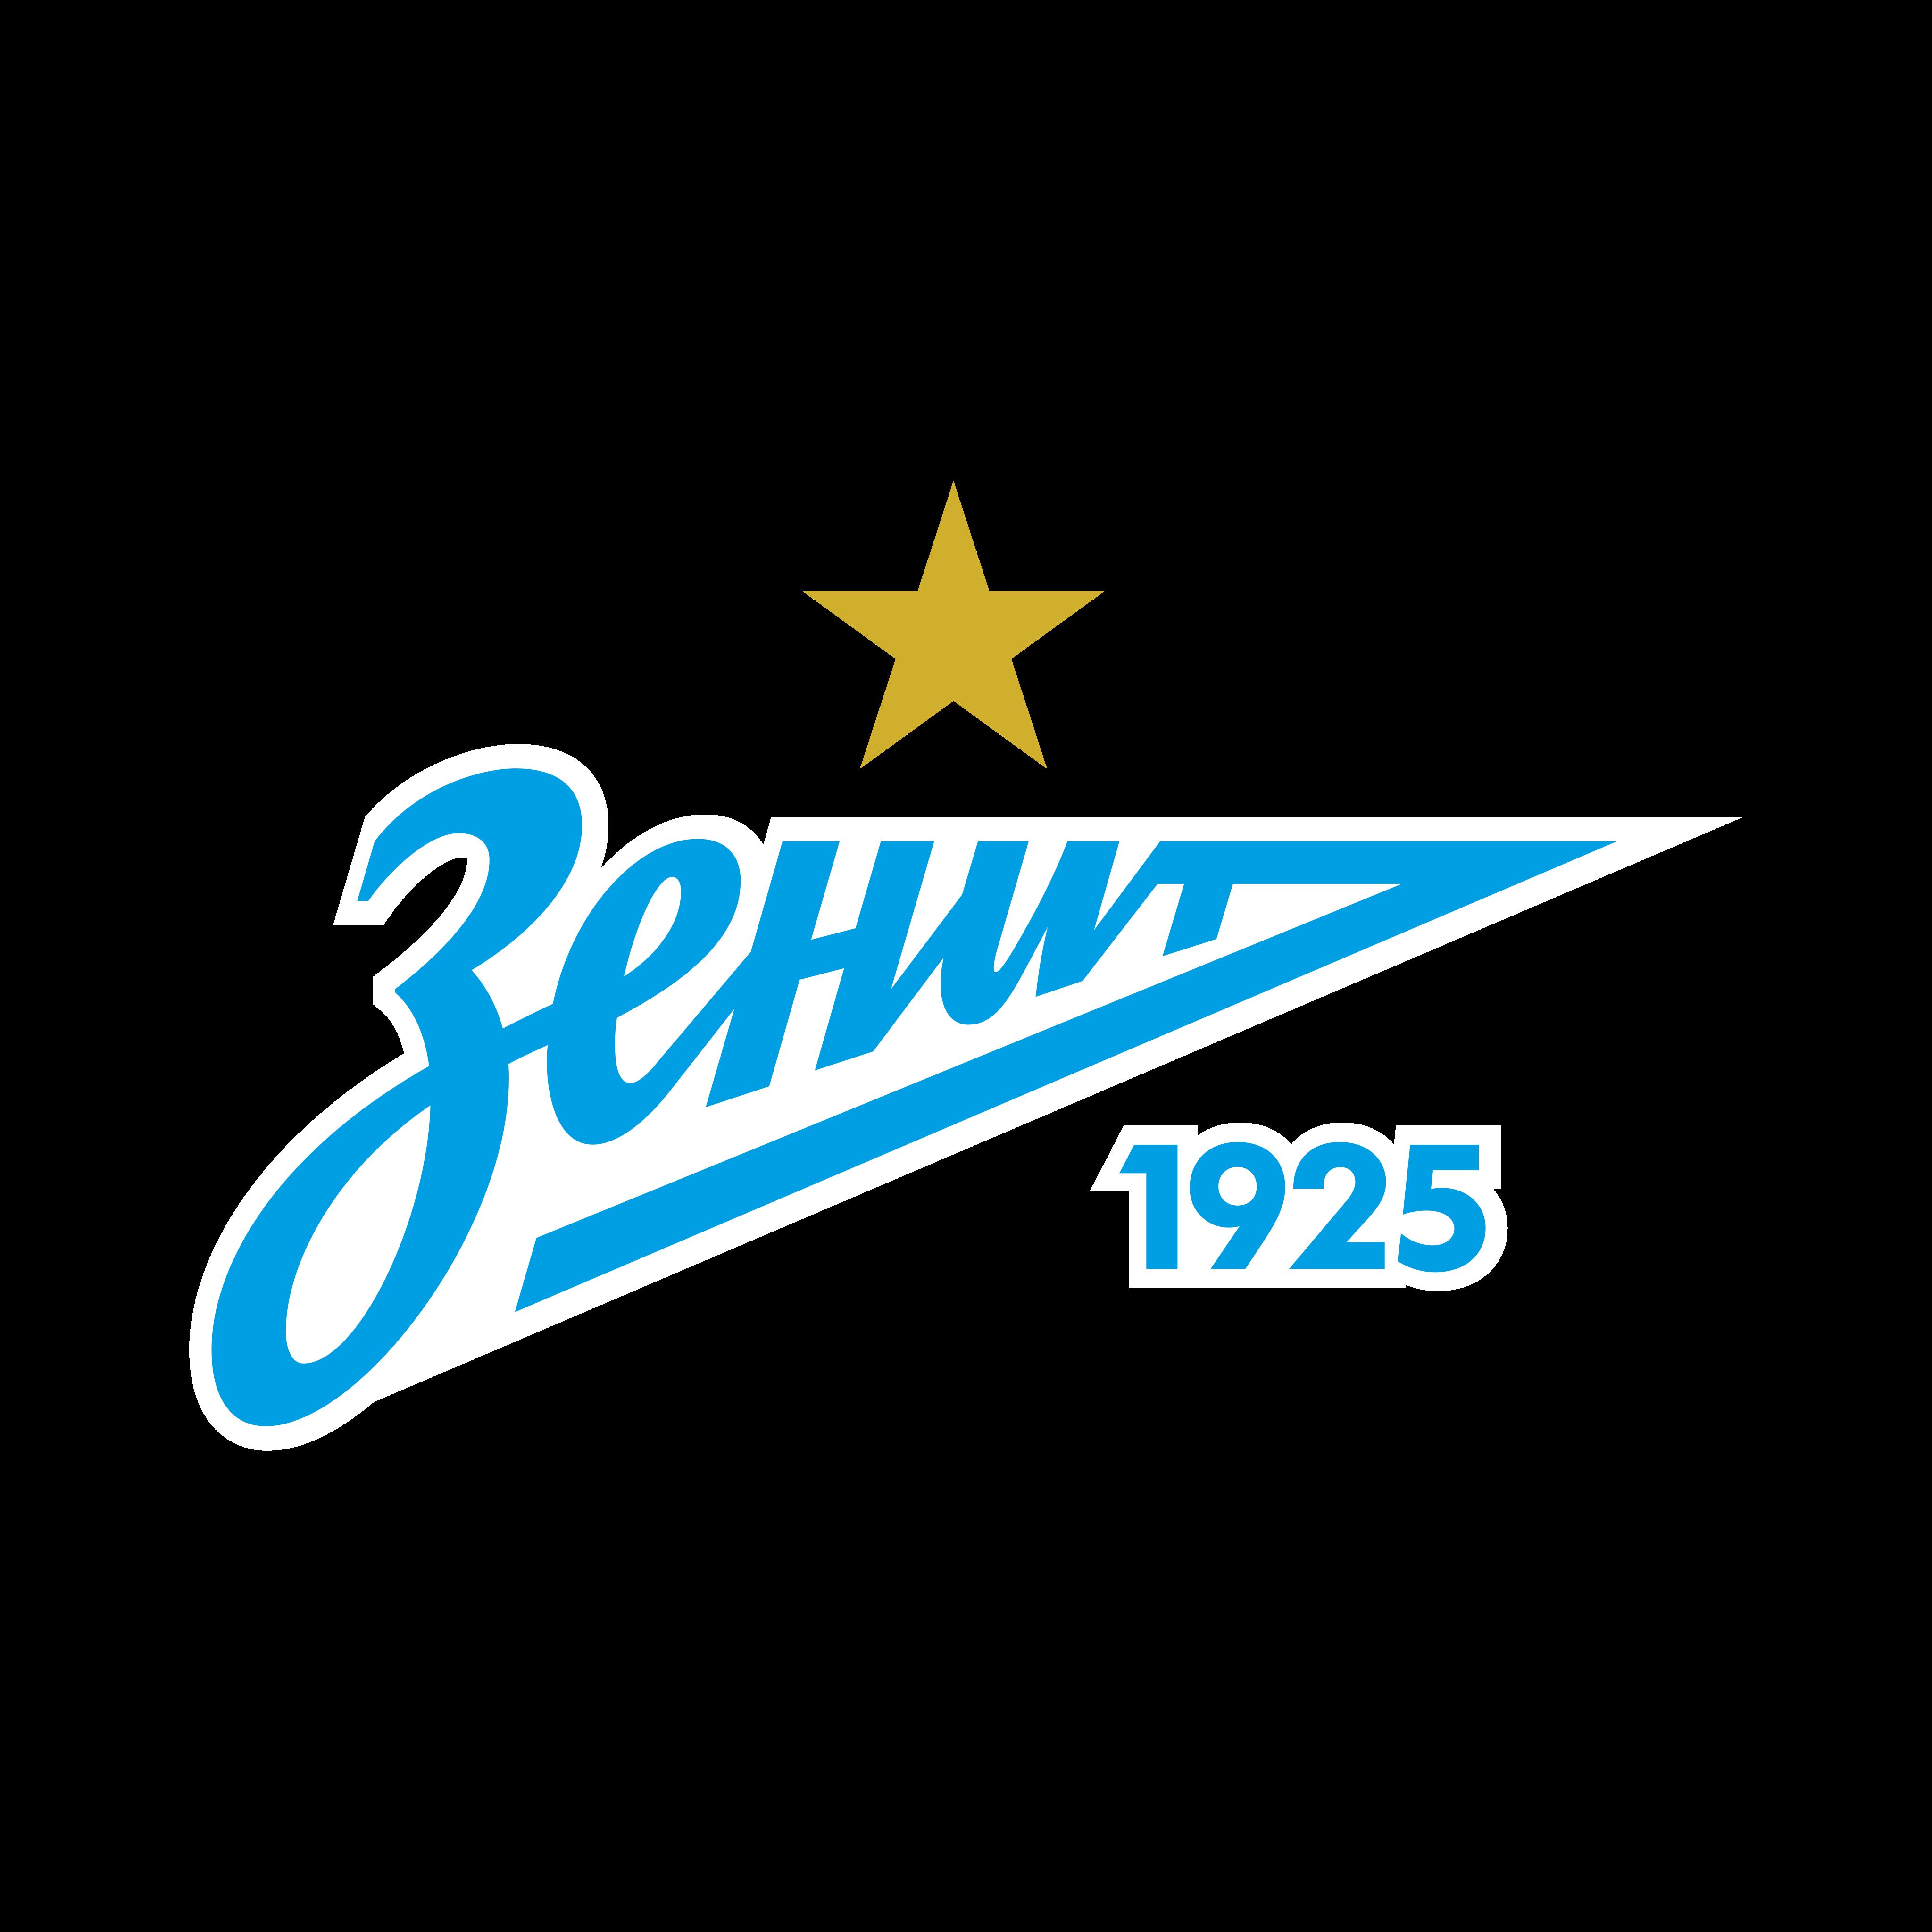 fc zenit logo 0 - FC Zenit Logo - Escudo